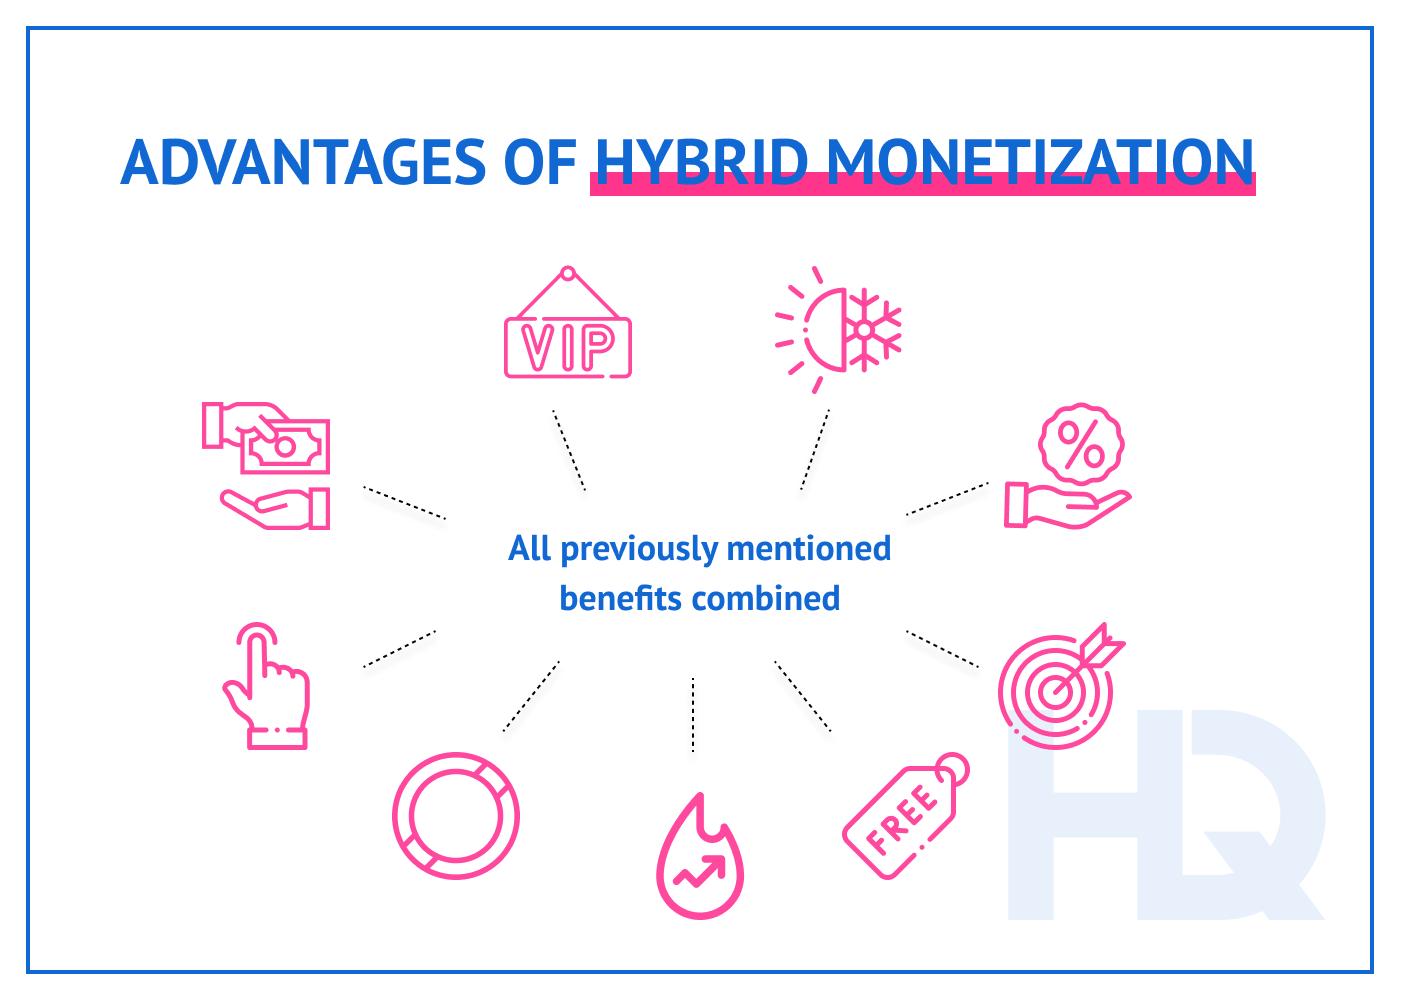 Advantages of hybrid monetization model.